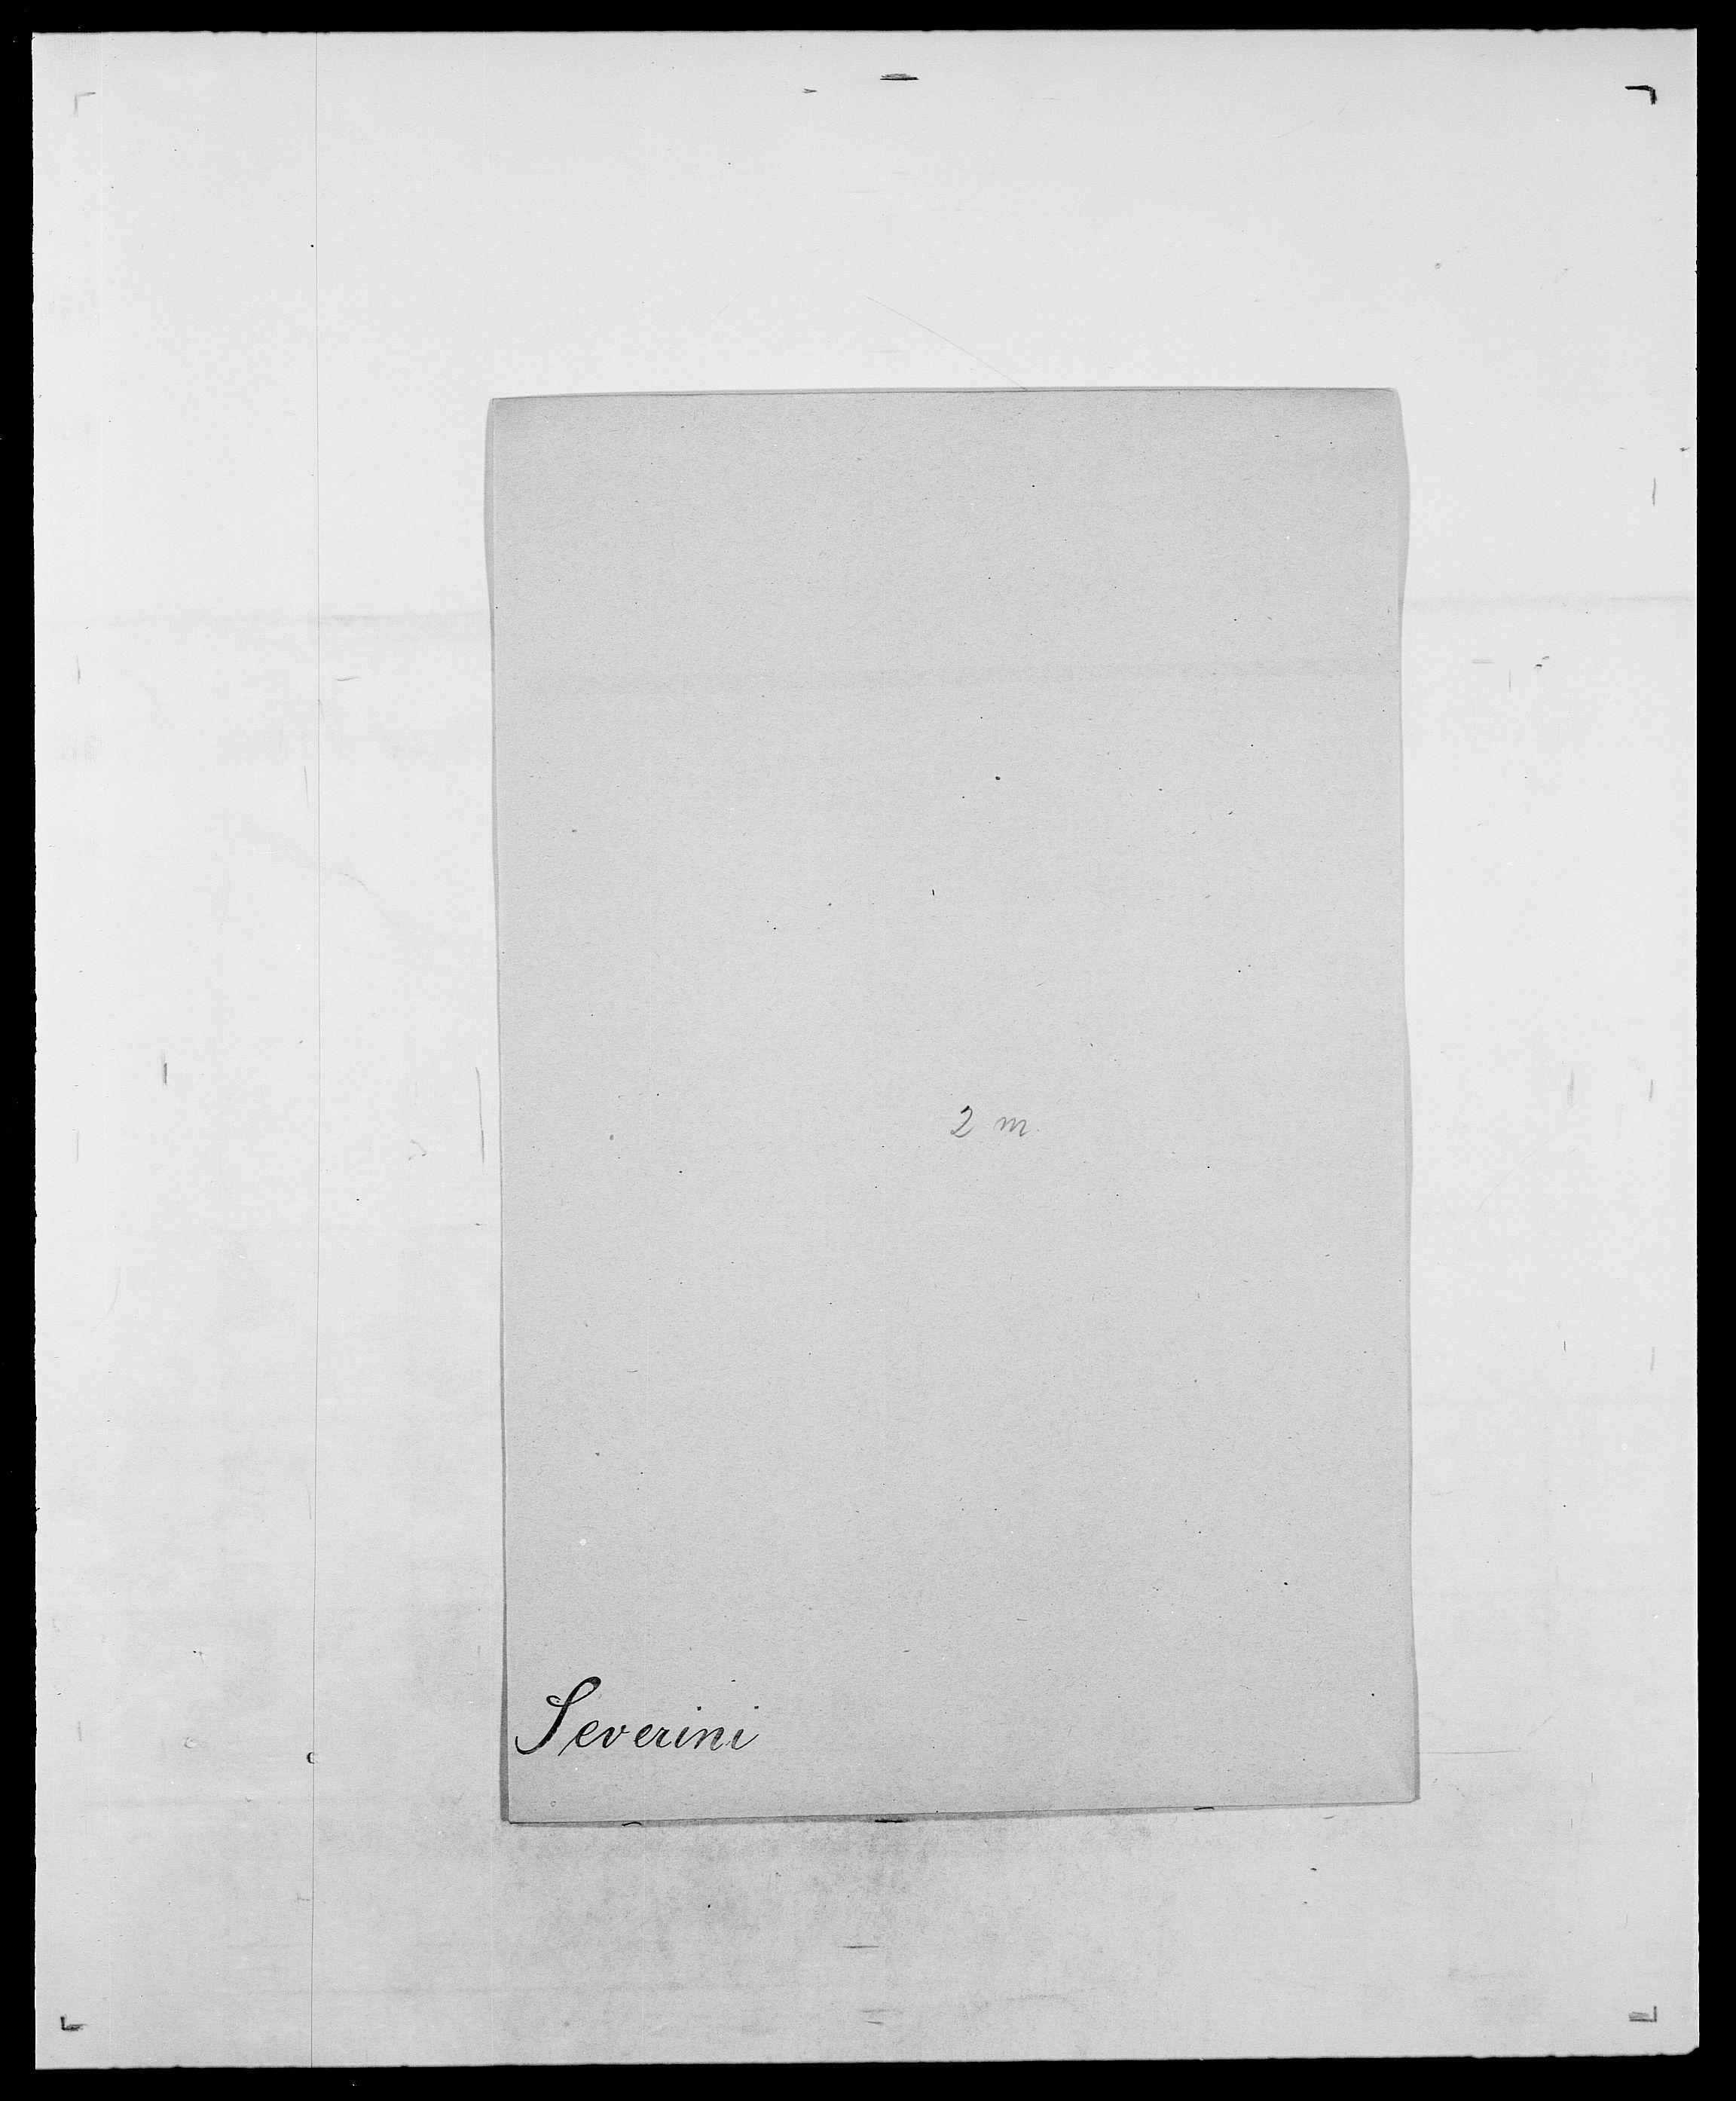 SAO, Delgobe, Charles Antoine - samling, D/Da/L0035: Schnabel - sjetman, s. 742